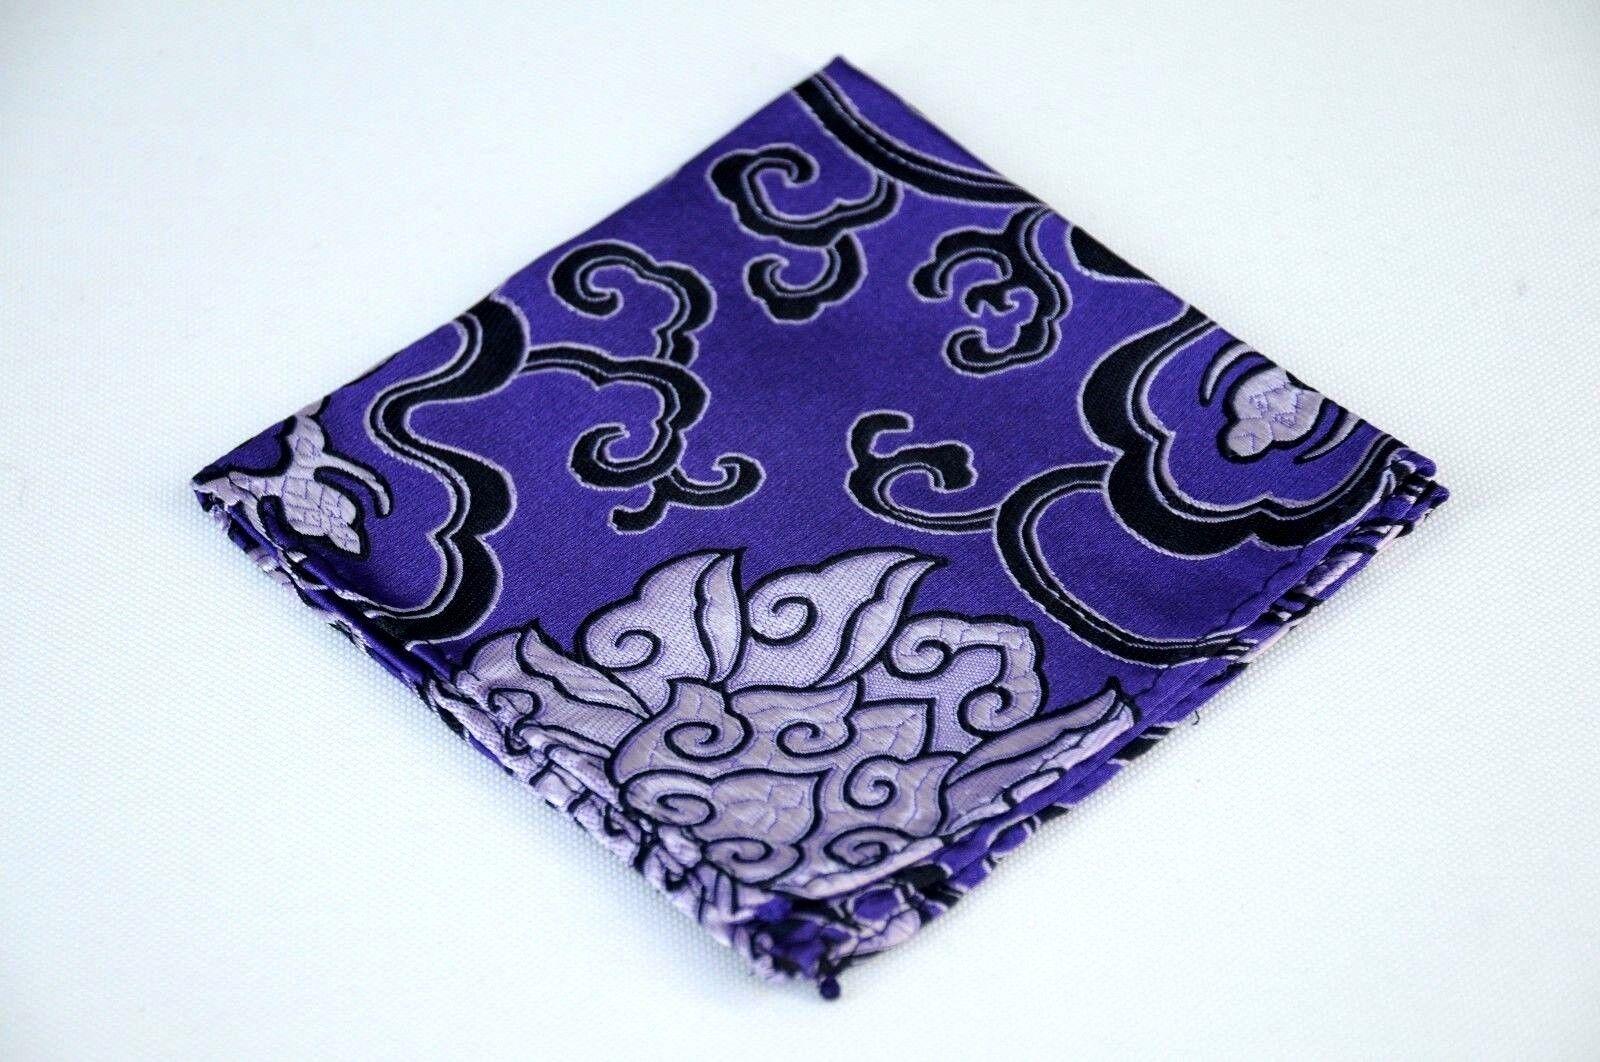 Lord R Colton Masterworks Pocket Square - Purple Black Madness Silk - New